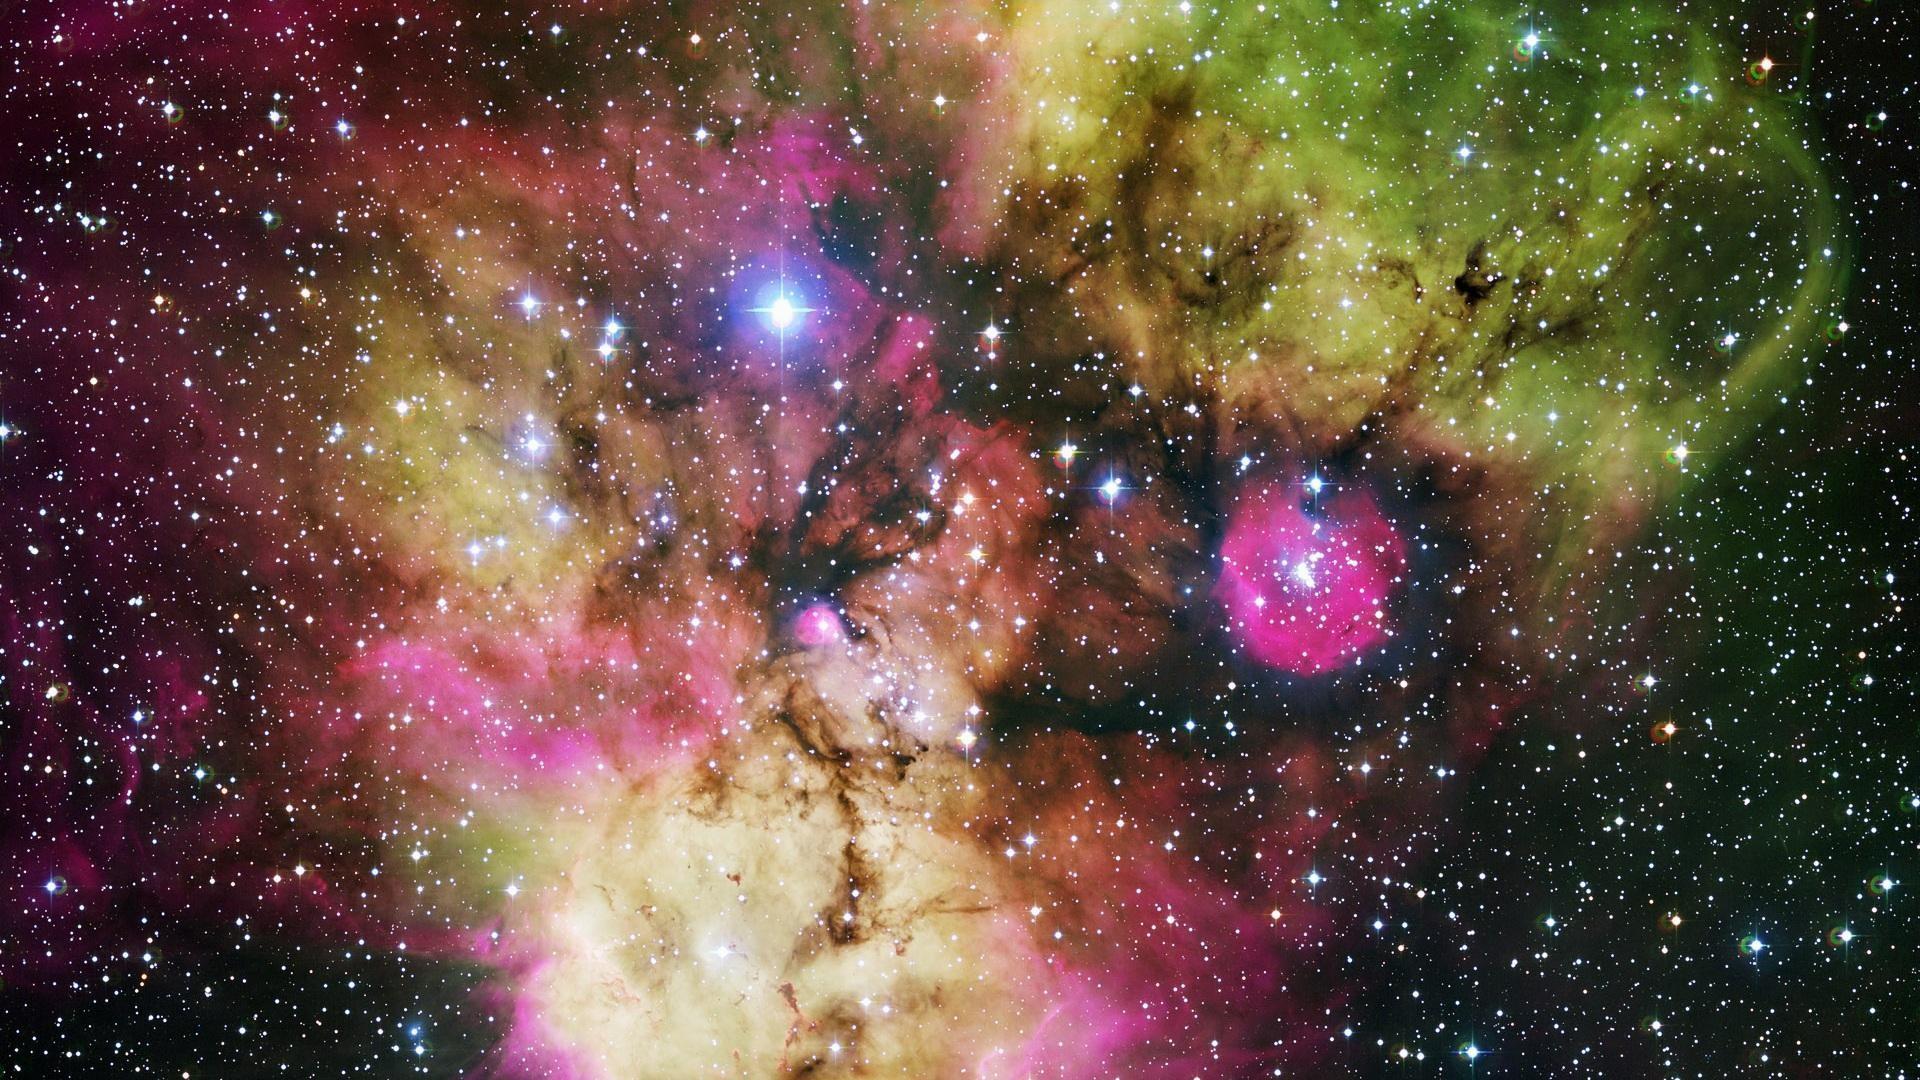 wallpaper.wiki-Hubble-Desktop-Wallpapers-1920×1080-PIC-WPD003226